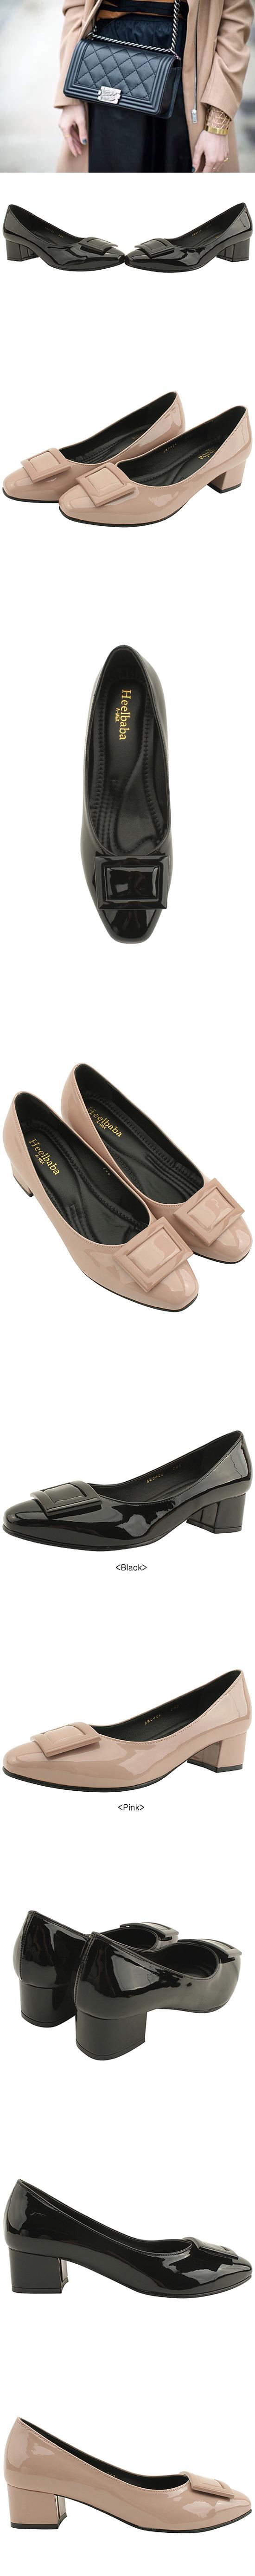 Enamel Full Heel Square Middle Heel Black